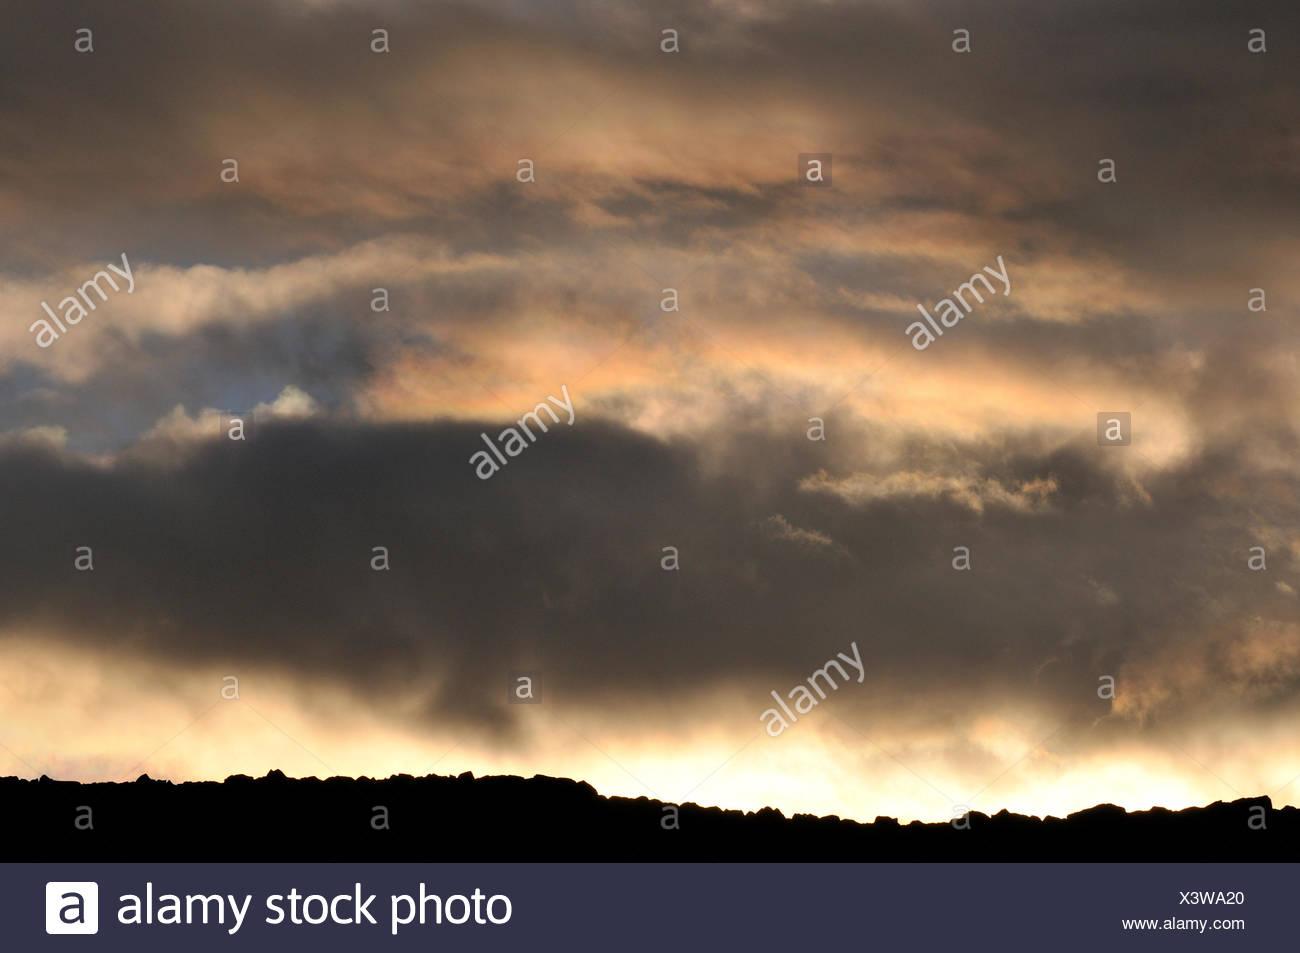 cloud color image Dalarna horizontal nature Scandinavia sky Sweden weather - Stock Image